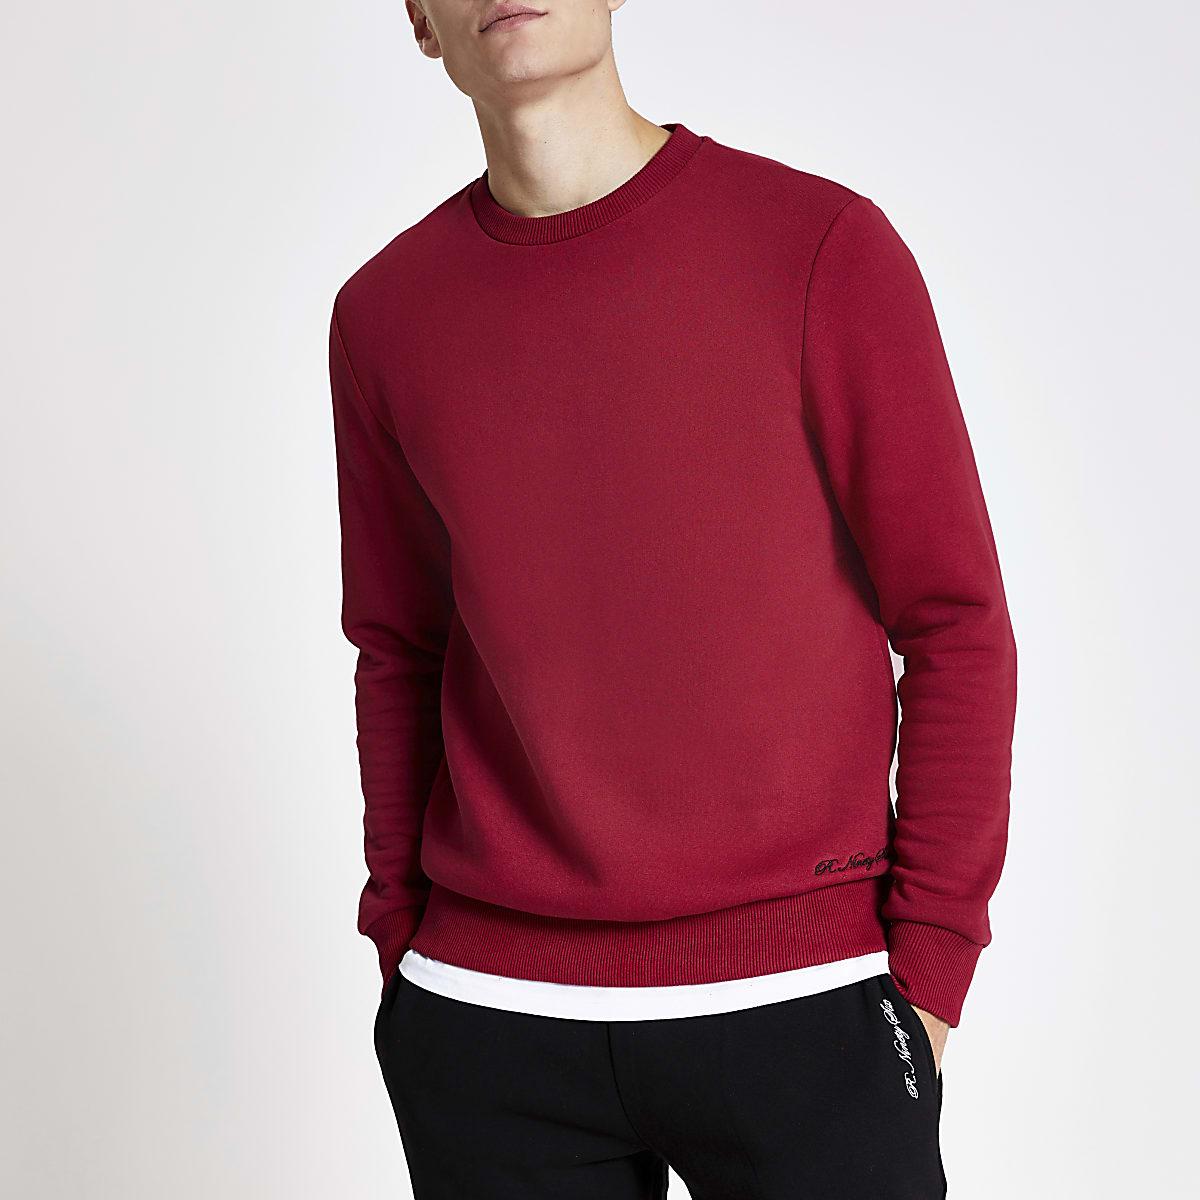 R96 - Rood slim-fit sweatshirt